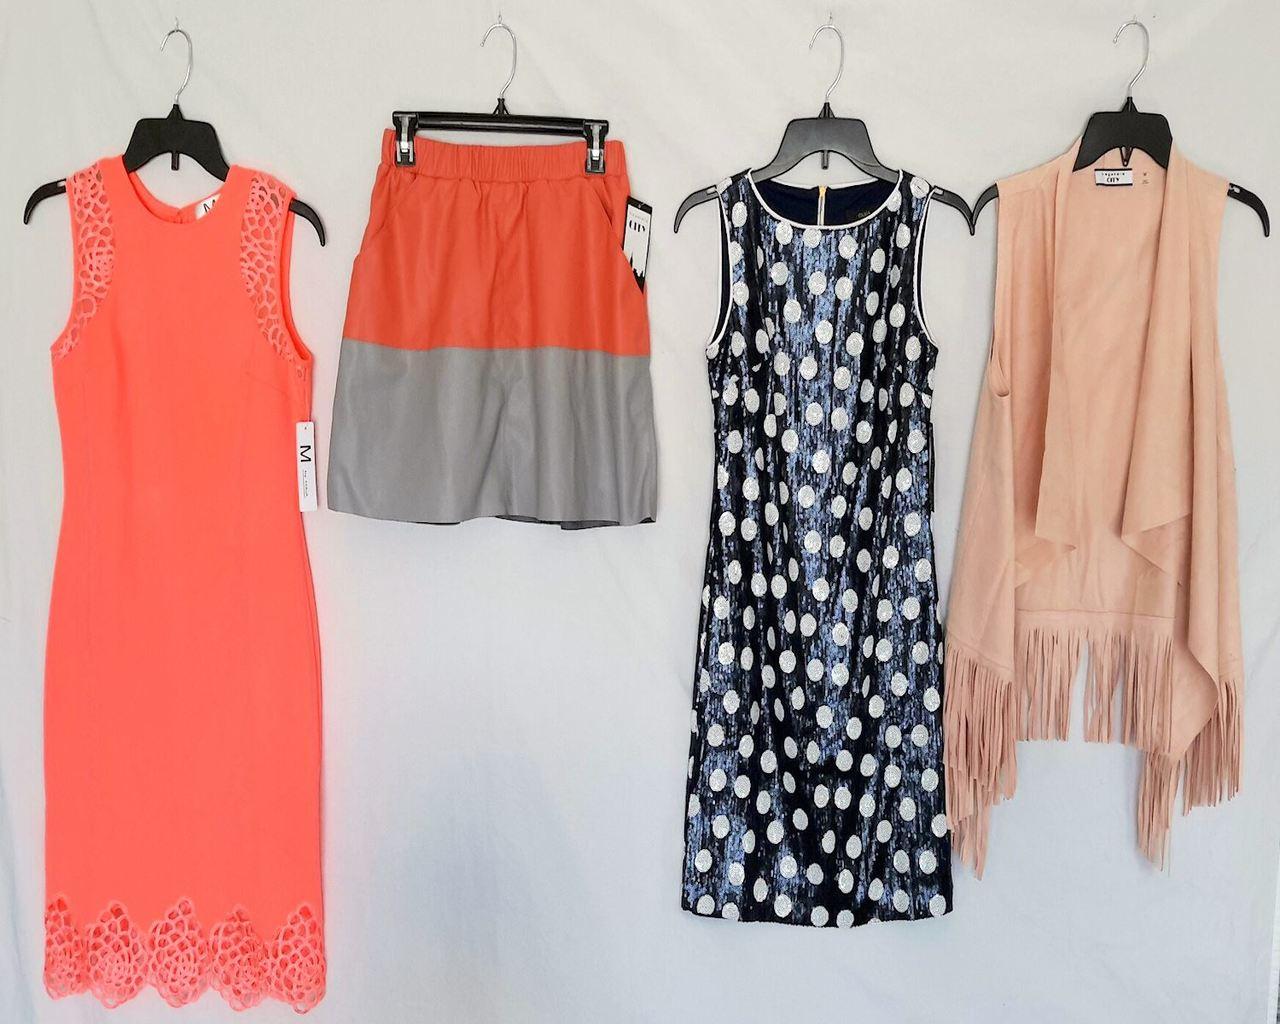 Wholesale Lot of 60 Designer Womens CLOTHING CLOTHING Maia Bagatelle Mixed Sizes Styles Brand New Ov